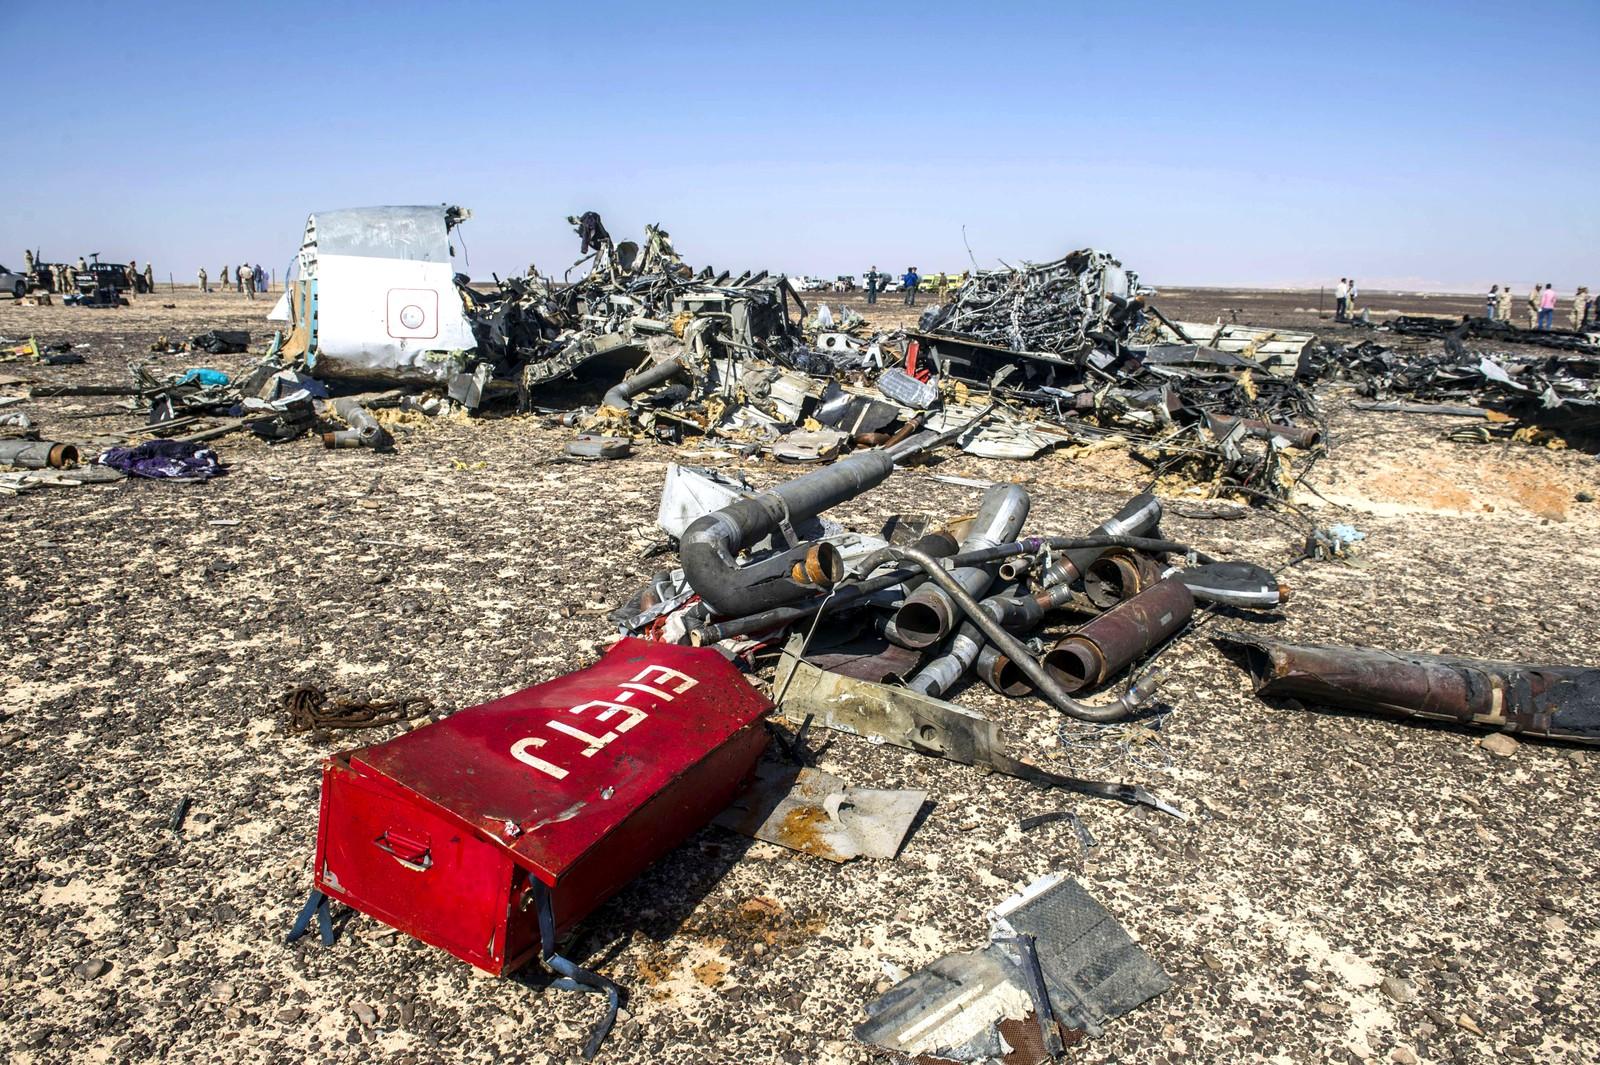 Deler fra det russiske flyet A321 ligger strødd utover bakken.